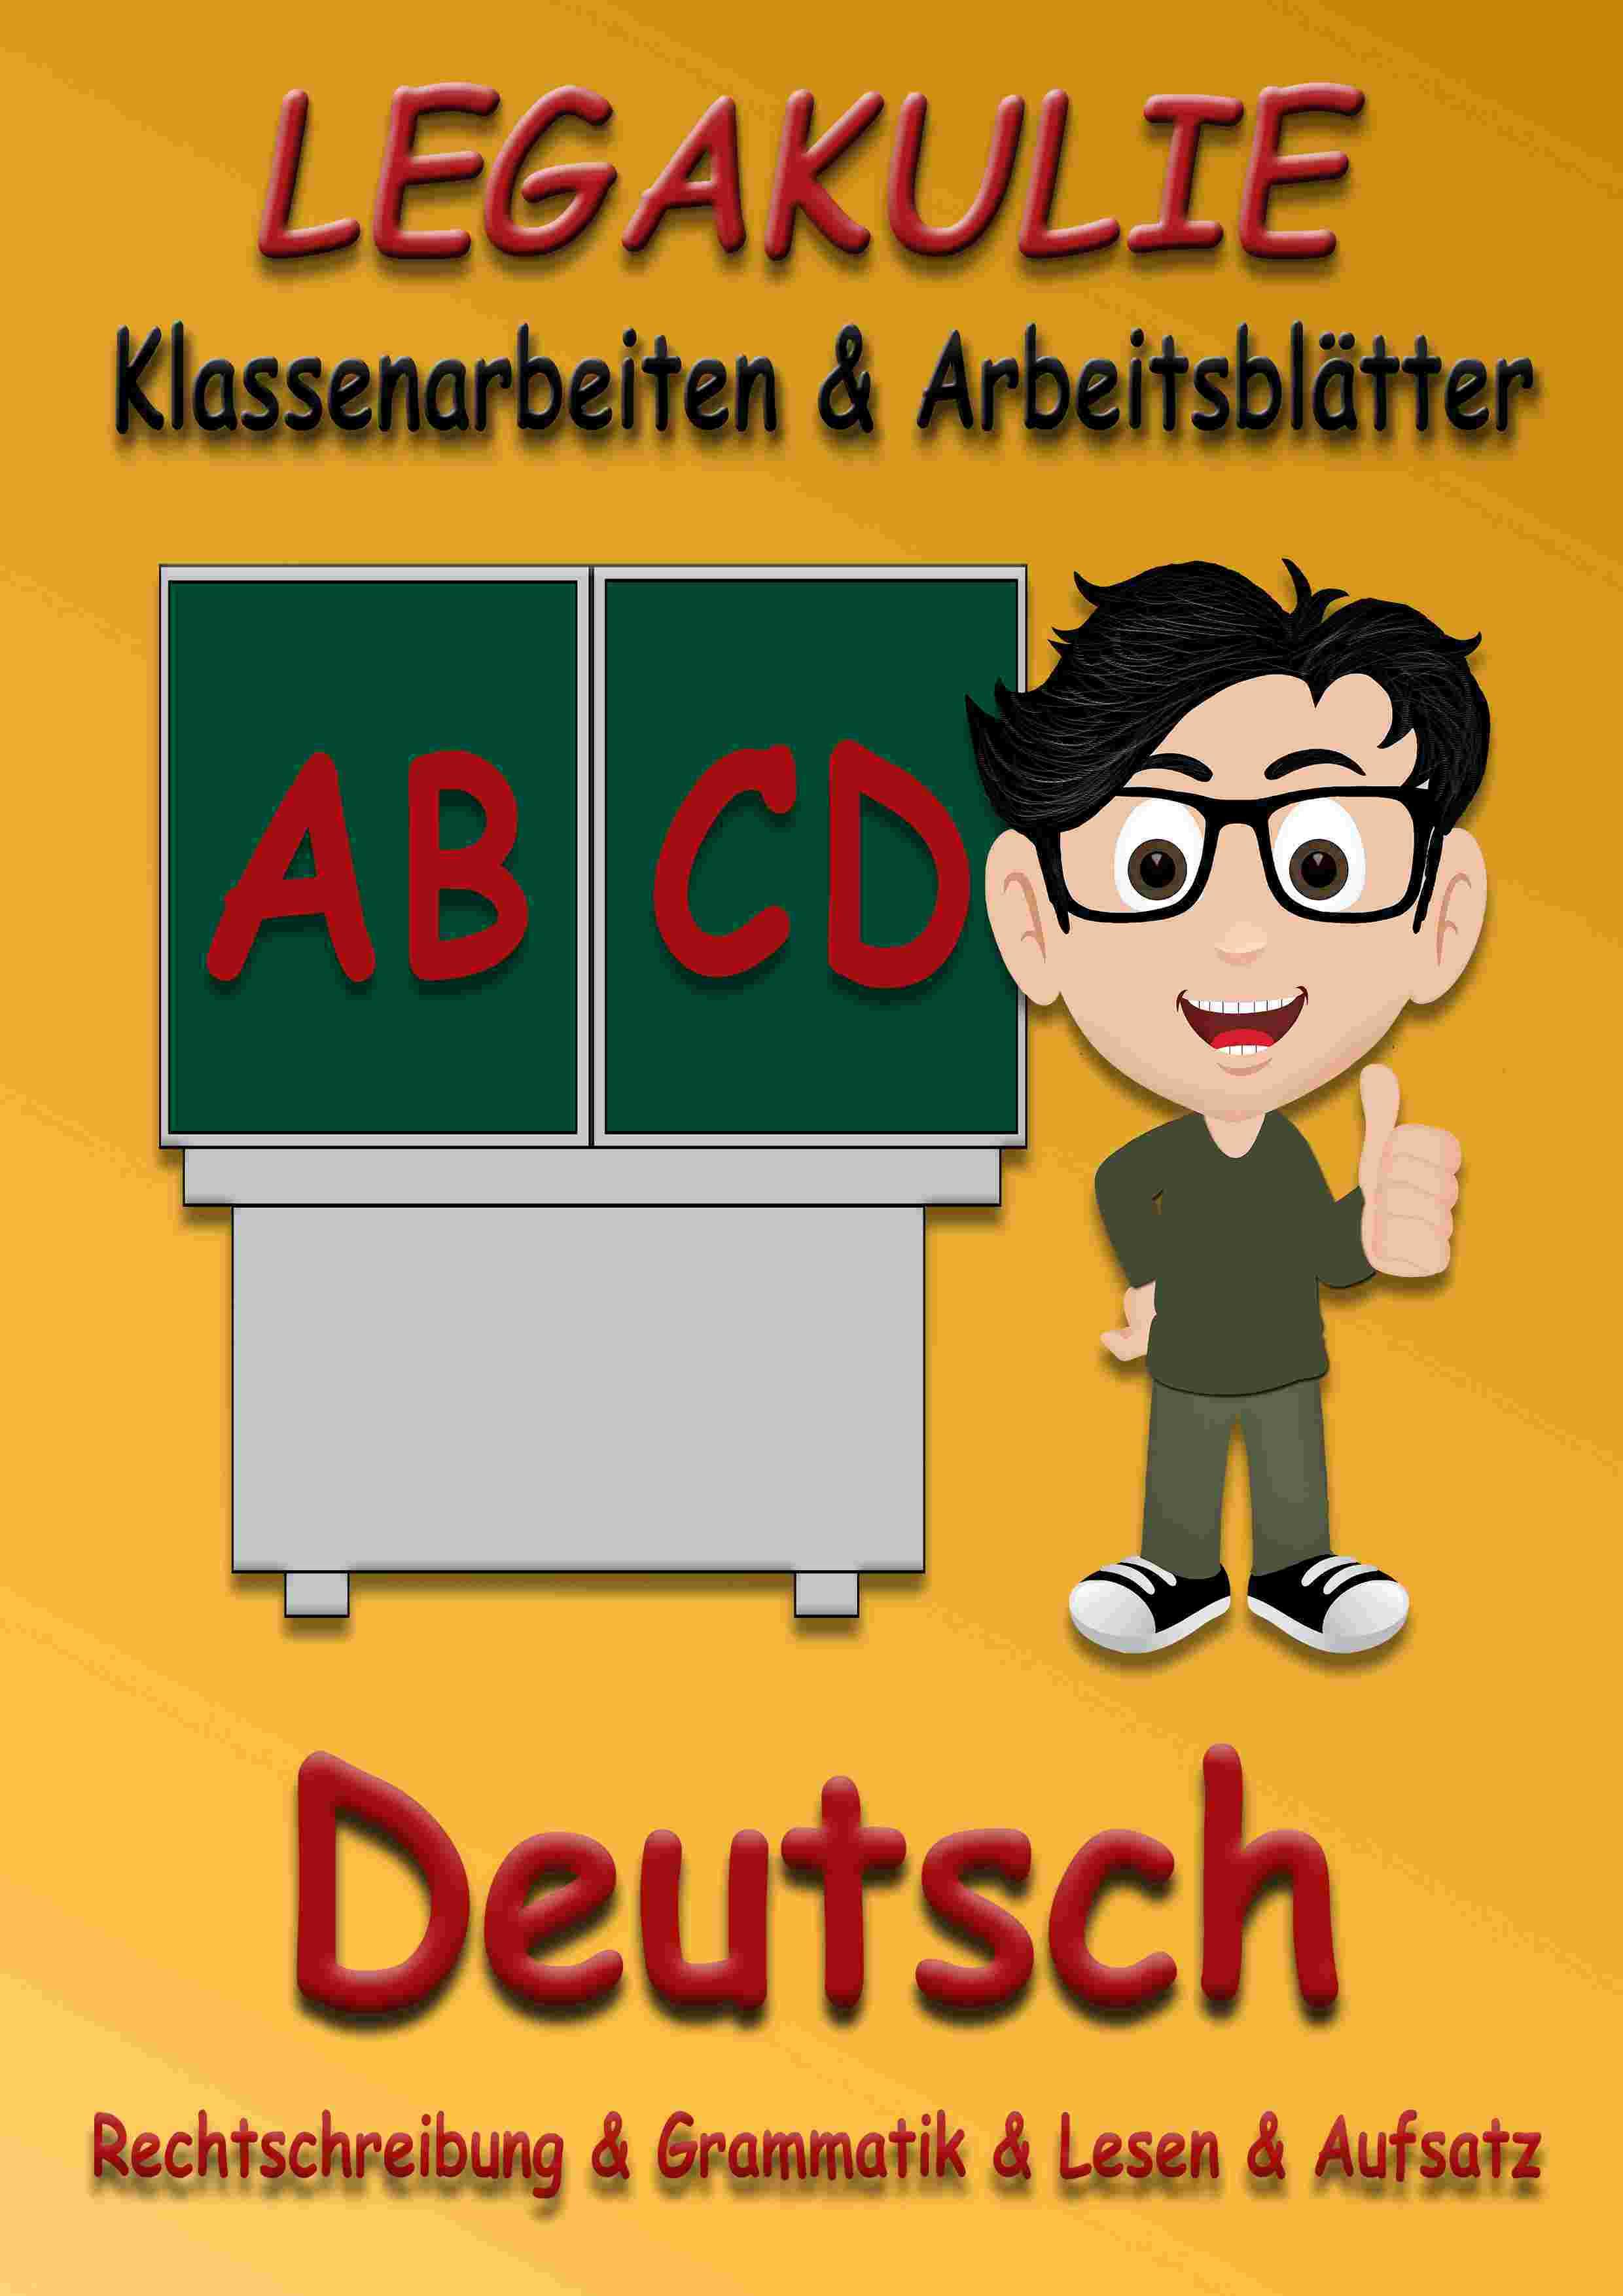 Ziemlich Grad 3 Hindi Arbeitsblatt Galerie - Arbeitsblatt Schule ...